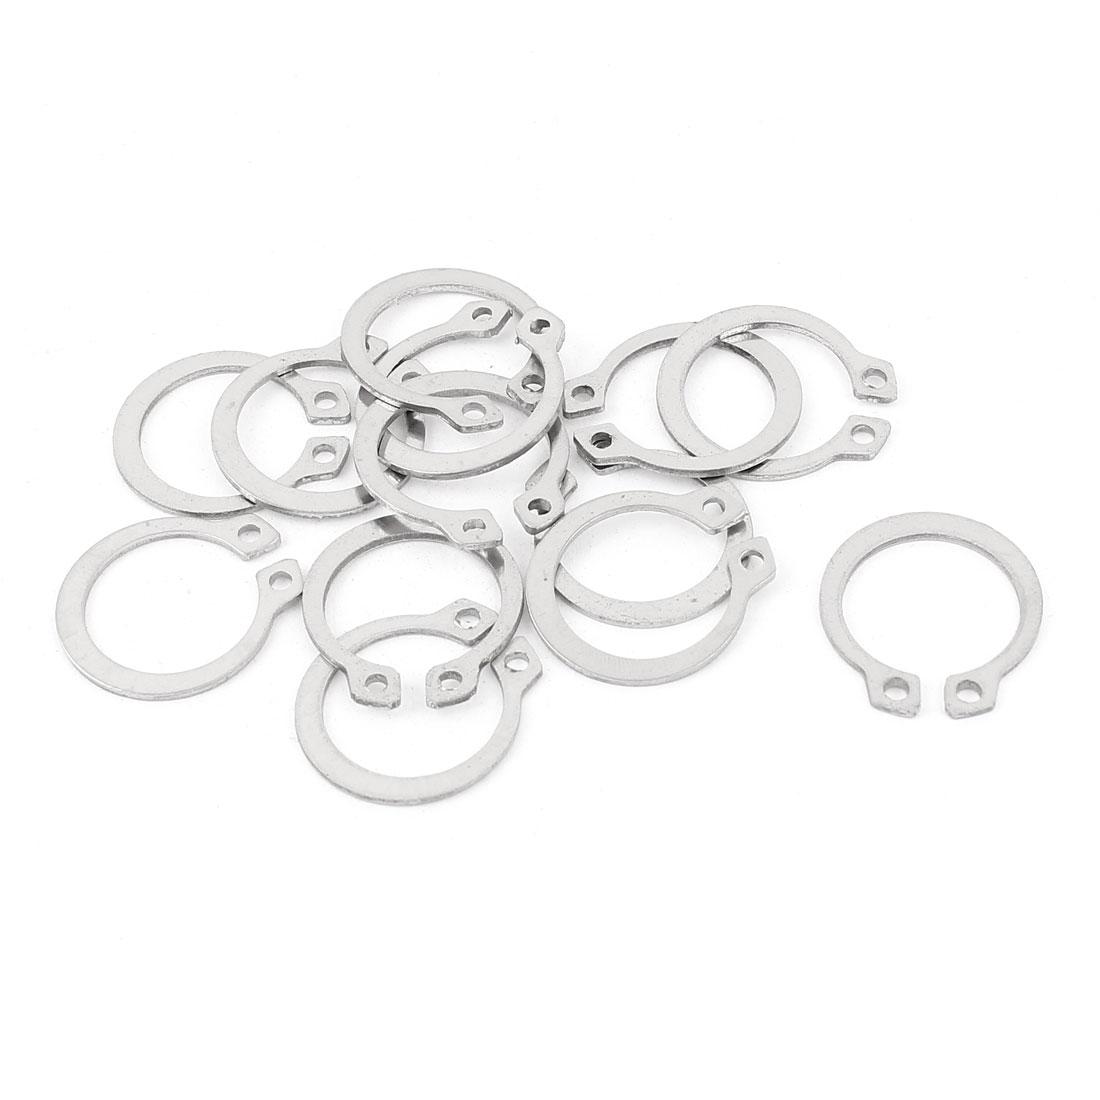 10pcs 304 Stainless Steel External Circlip Retaining Shaft Snap Rings 16mm